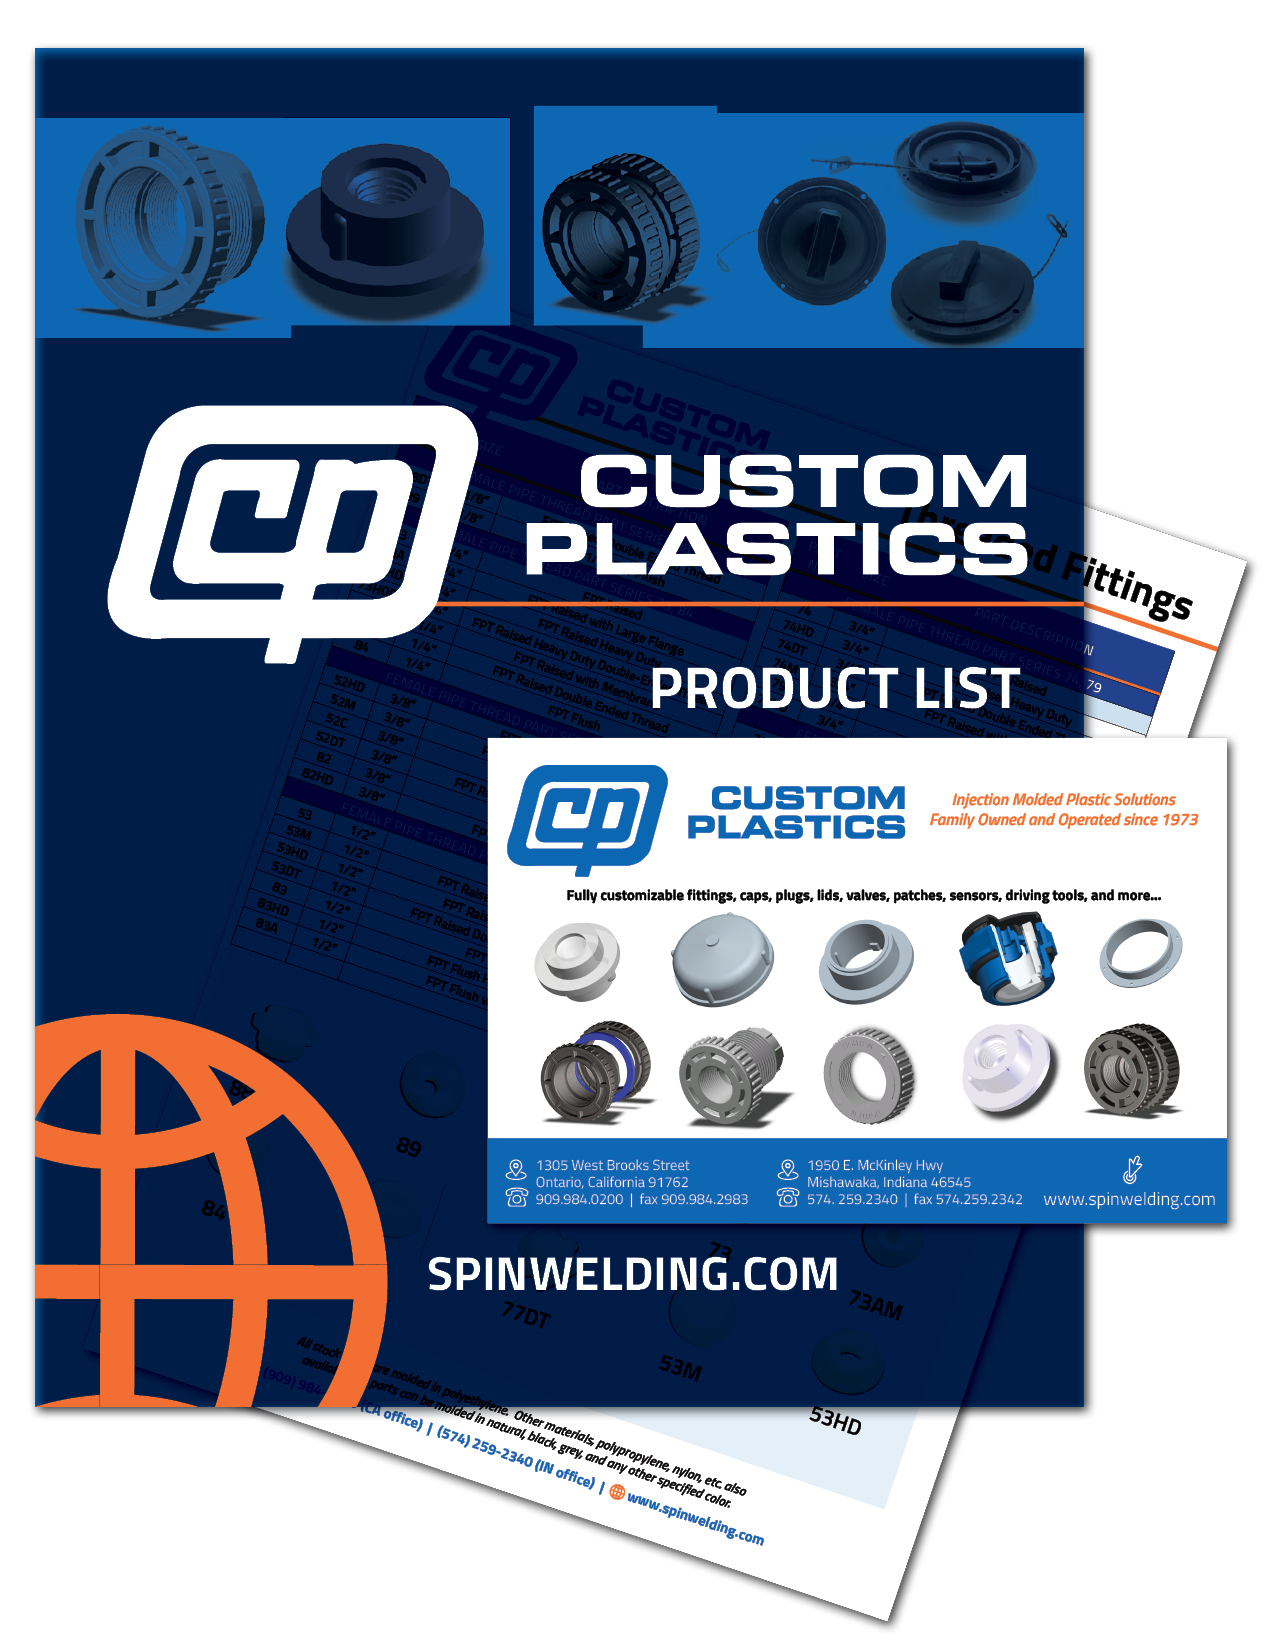 Custom Plastics Branding